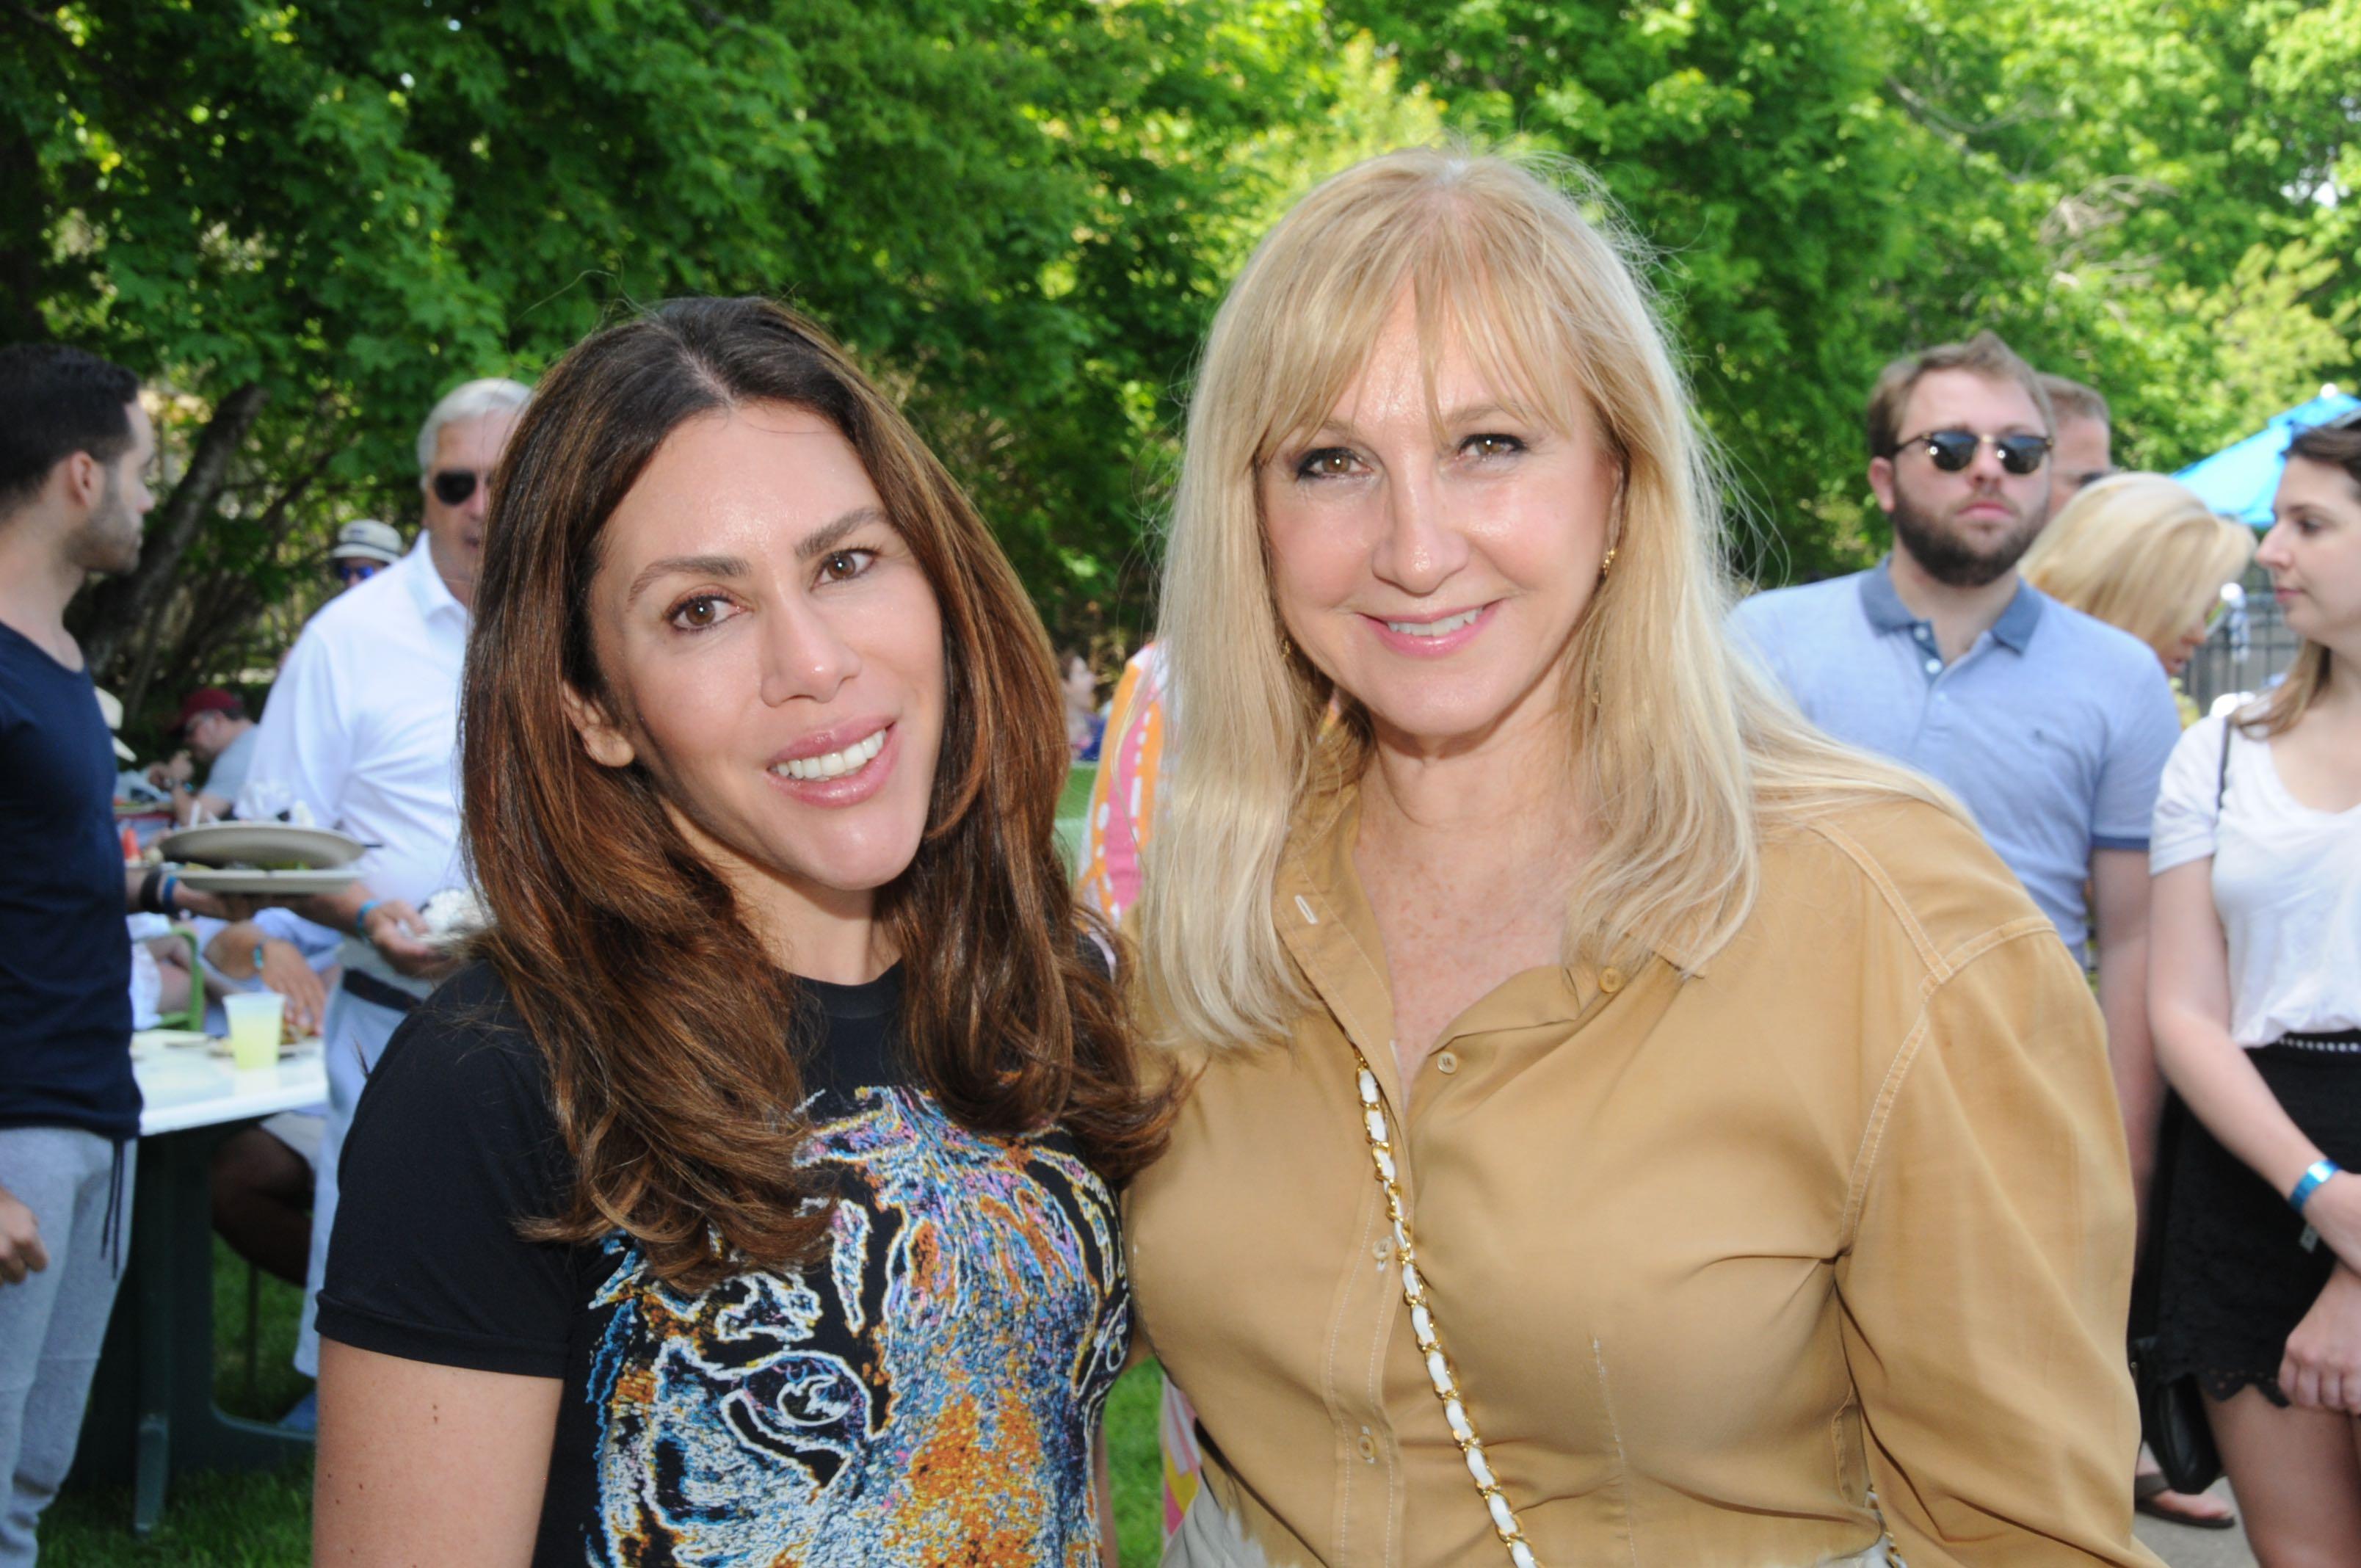 Suleina Arruda and Katlean De Monchy